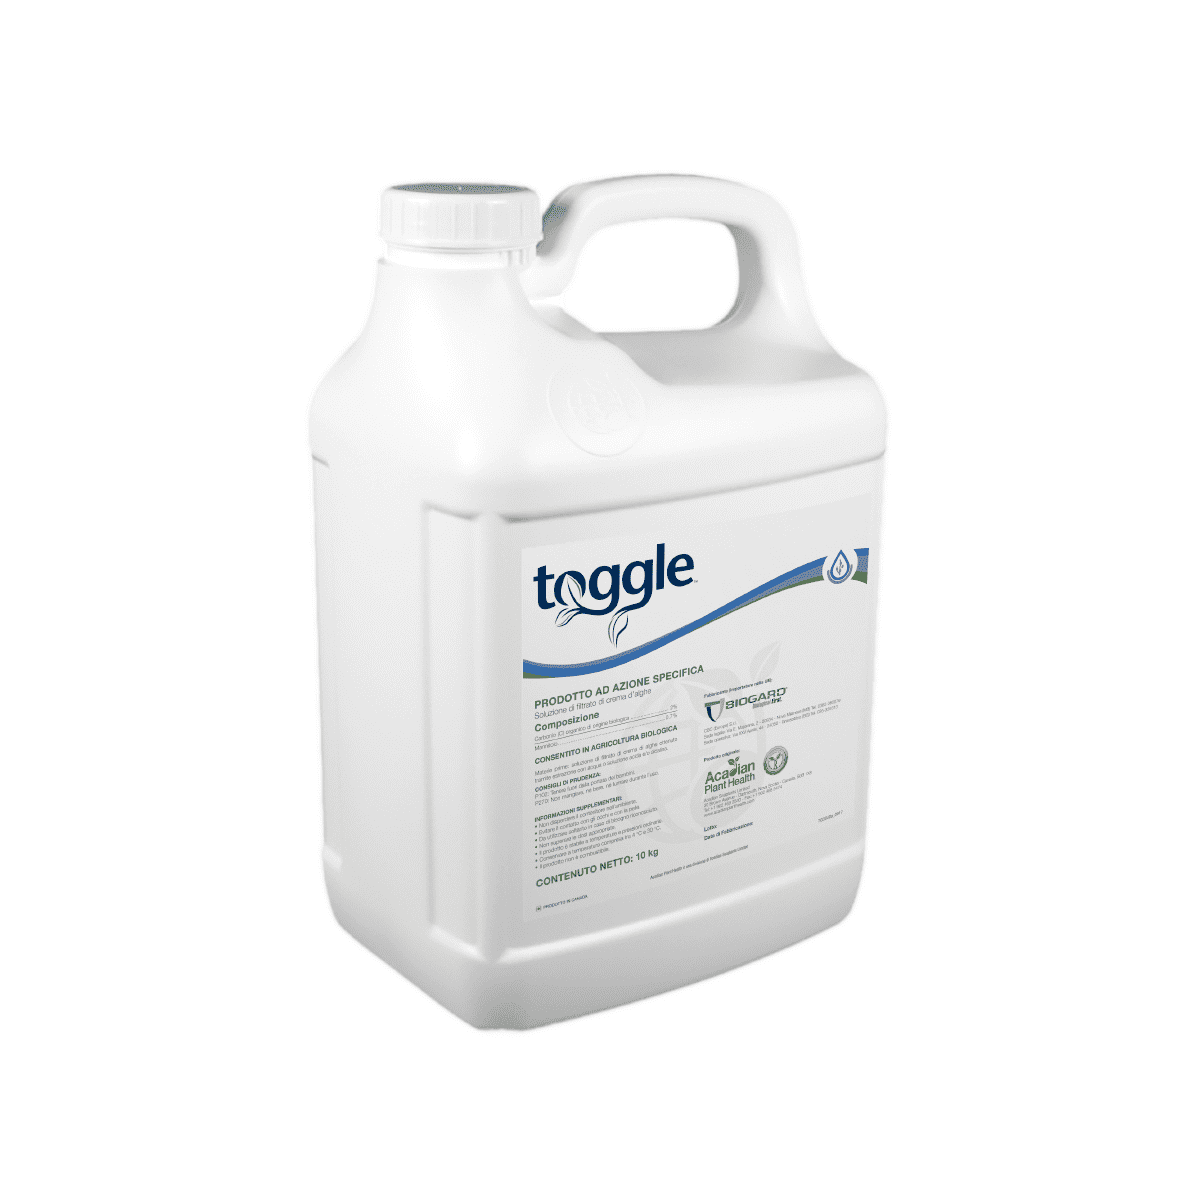 Biogard - Toggle®